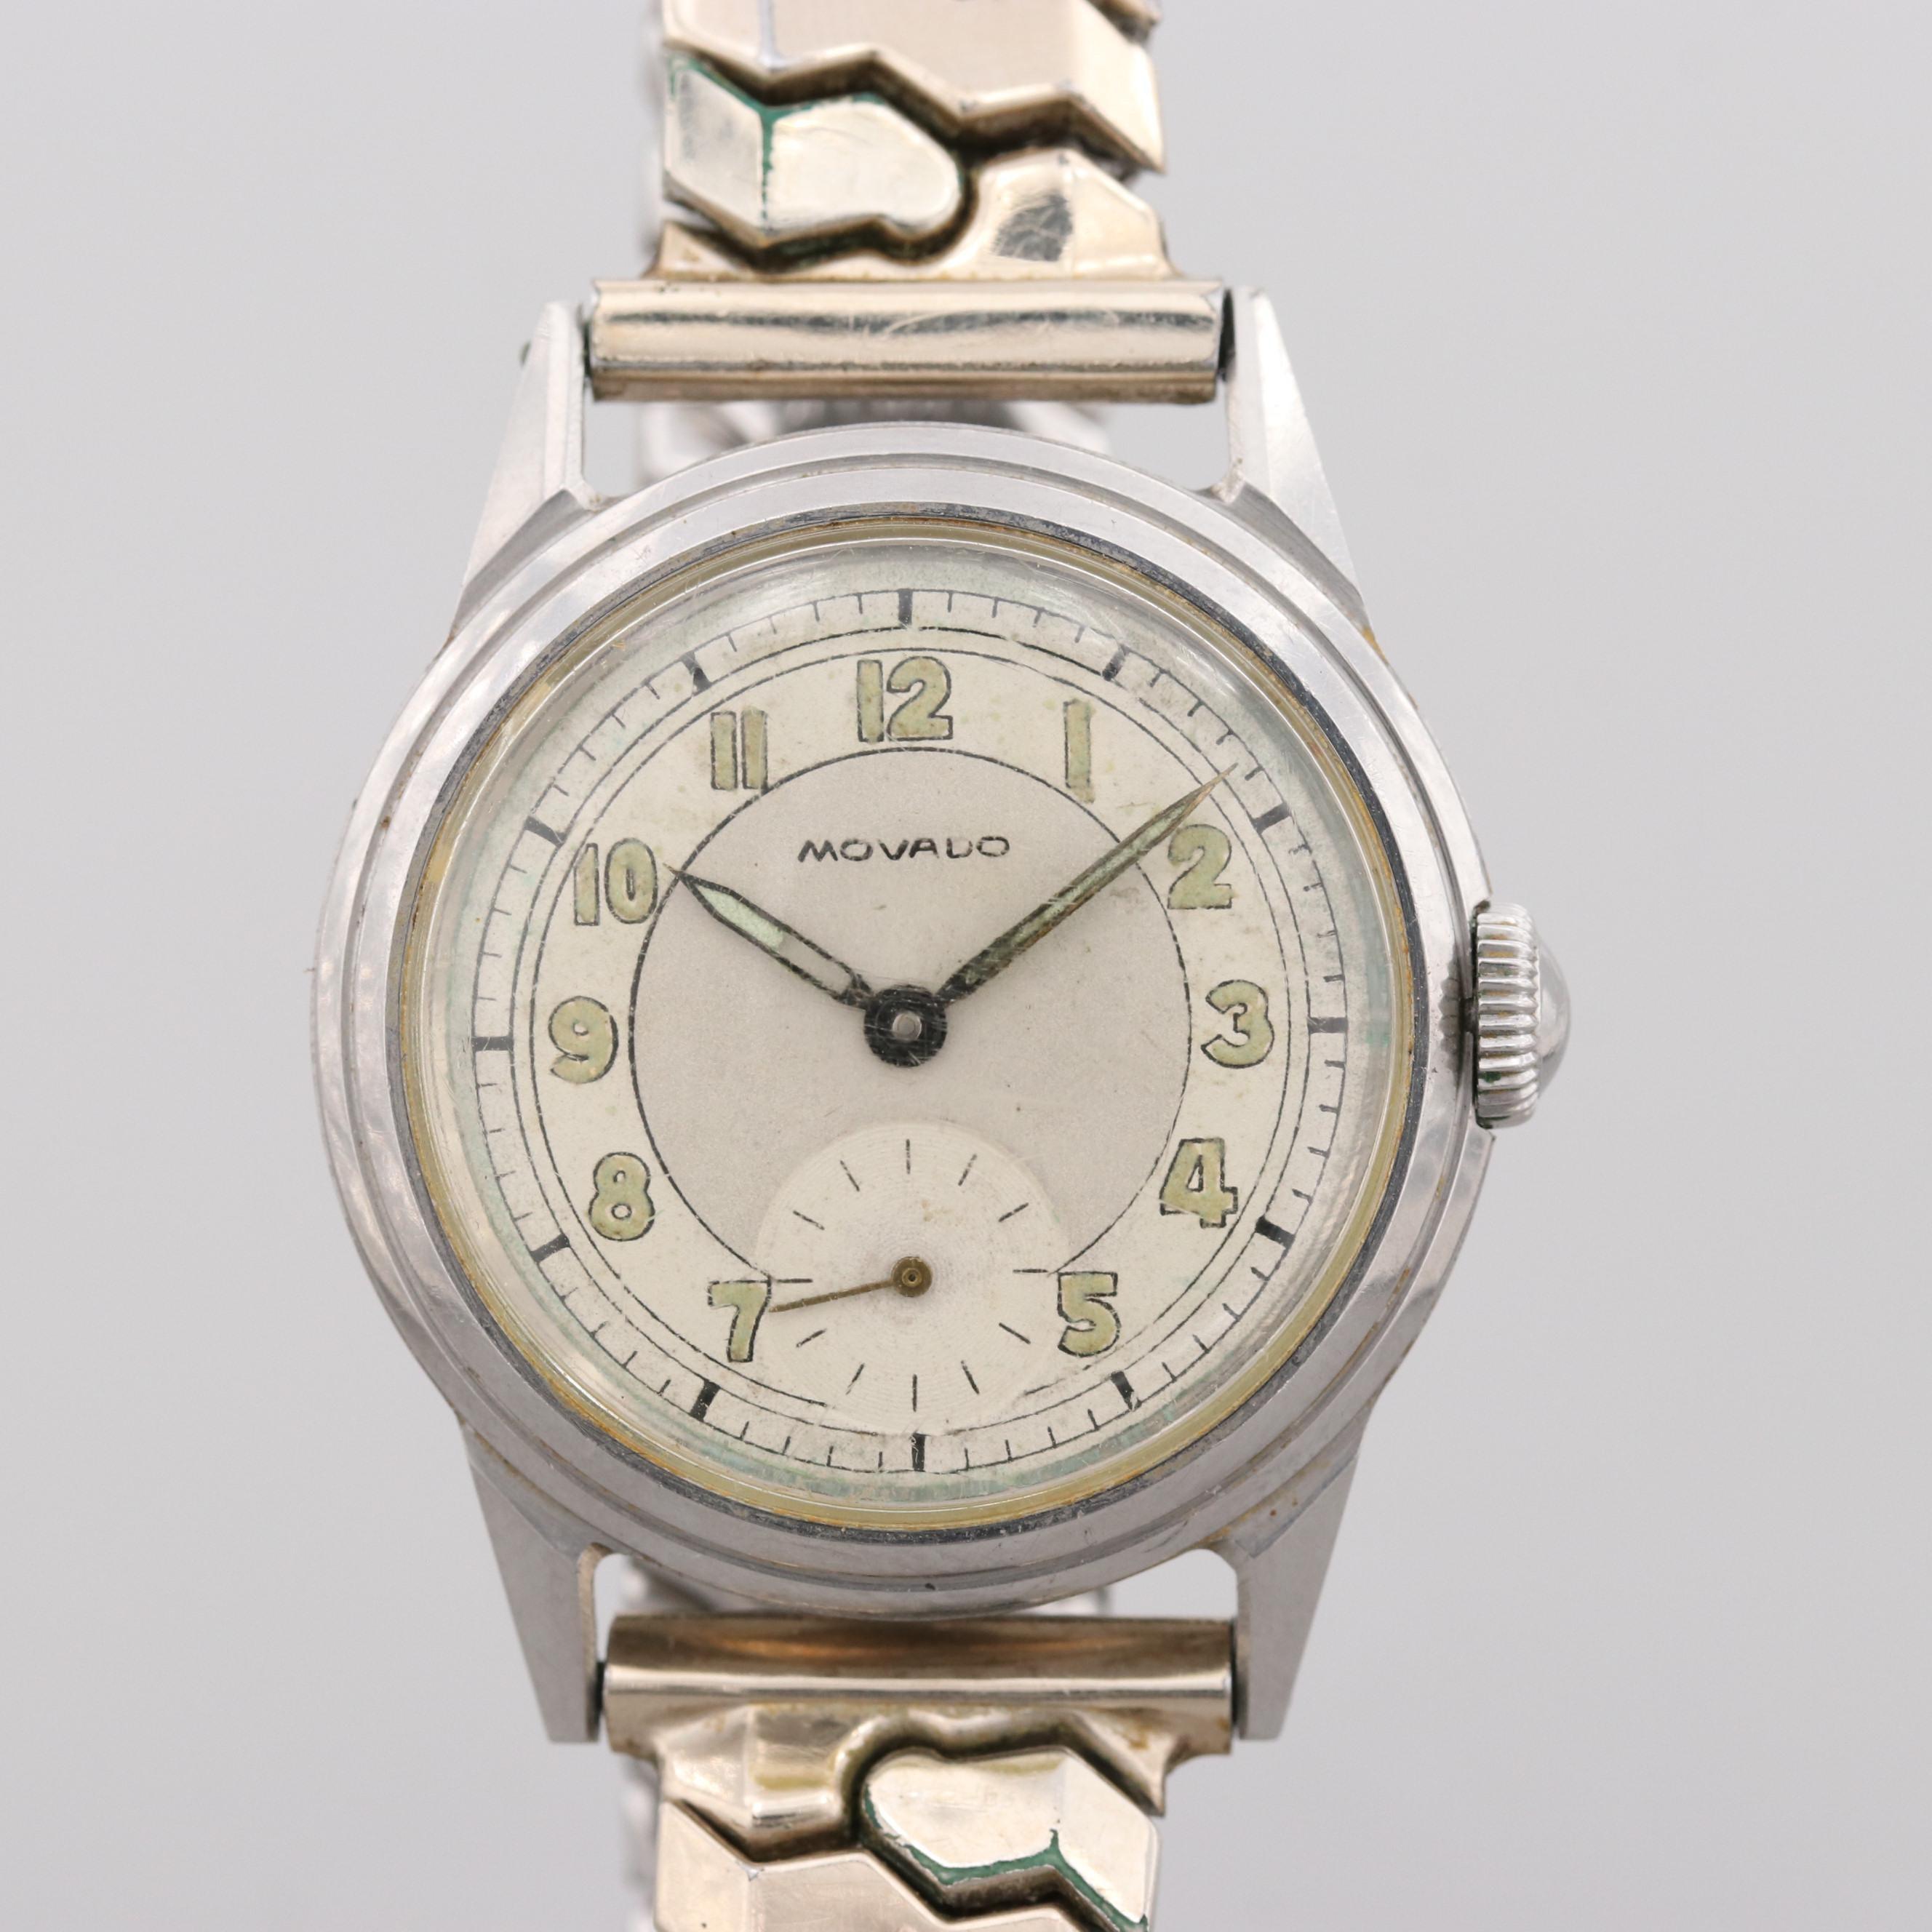 Vintage Movado Stainless Steel Stem Wind Wristwatch